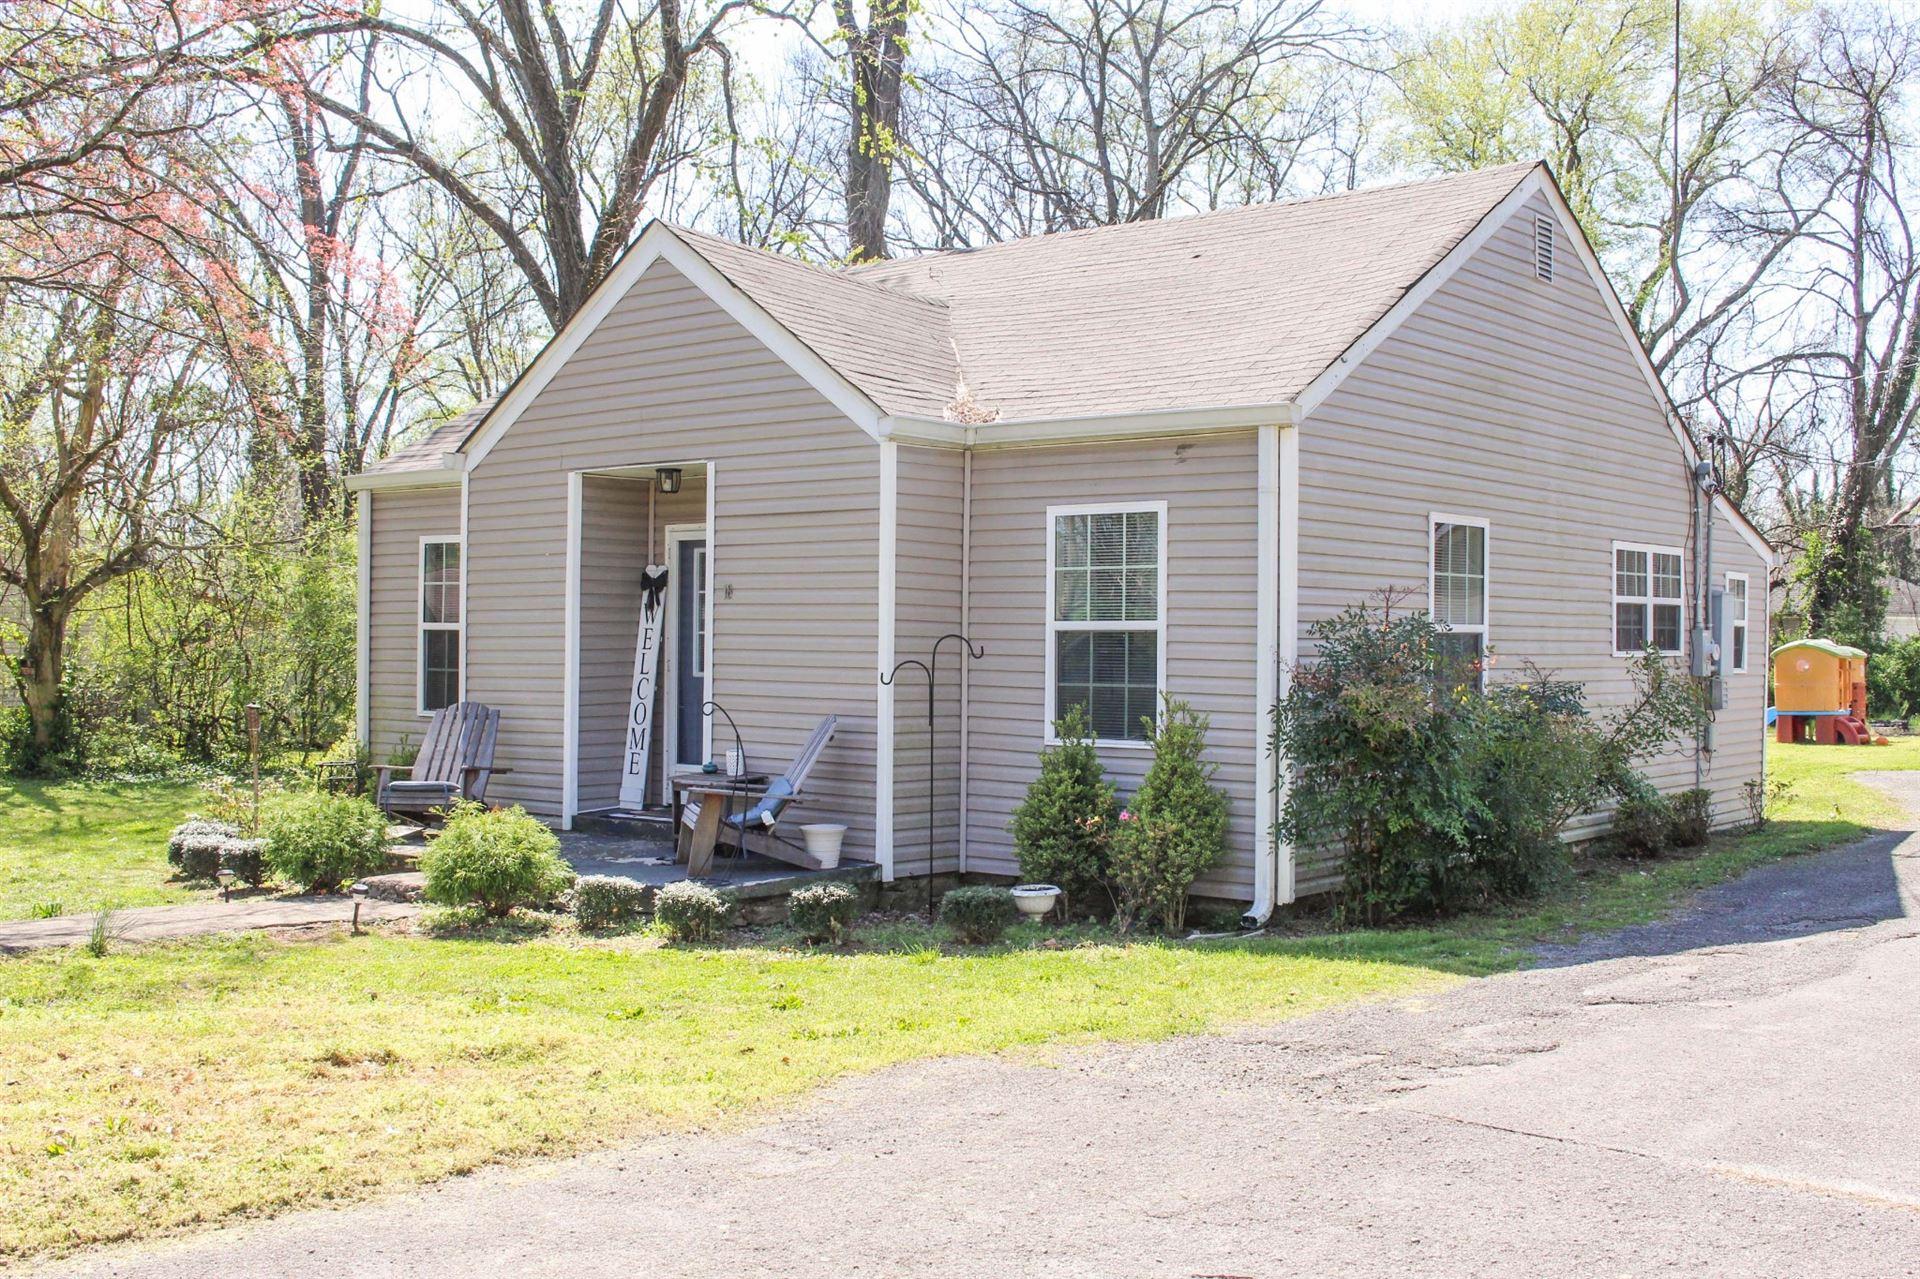 Photo of 316 S Bilbro Ave, Murfreesboro, TN 37130 (MLS # 2242787)